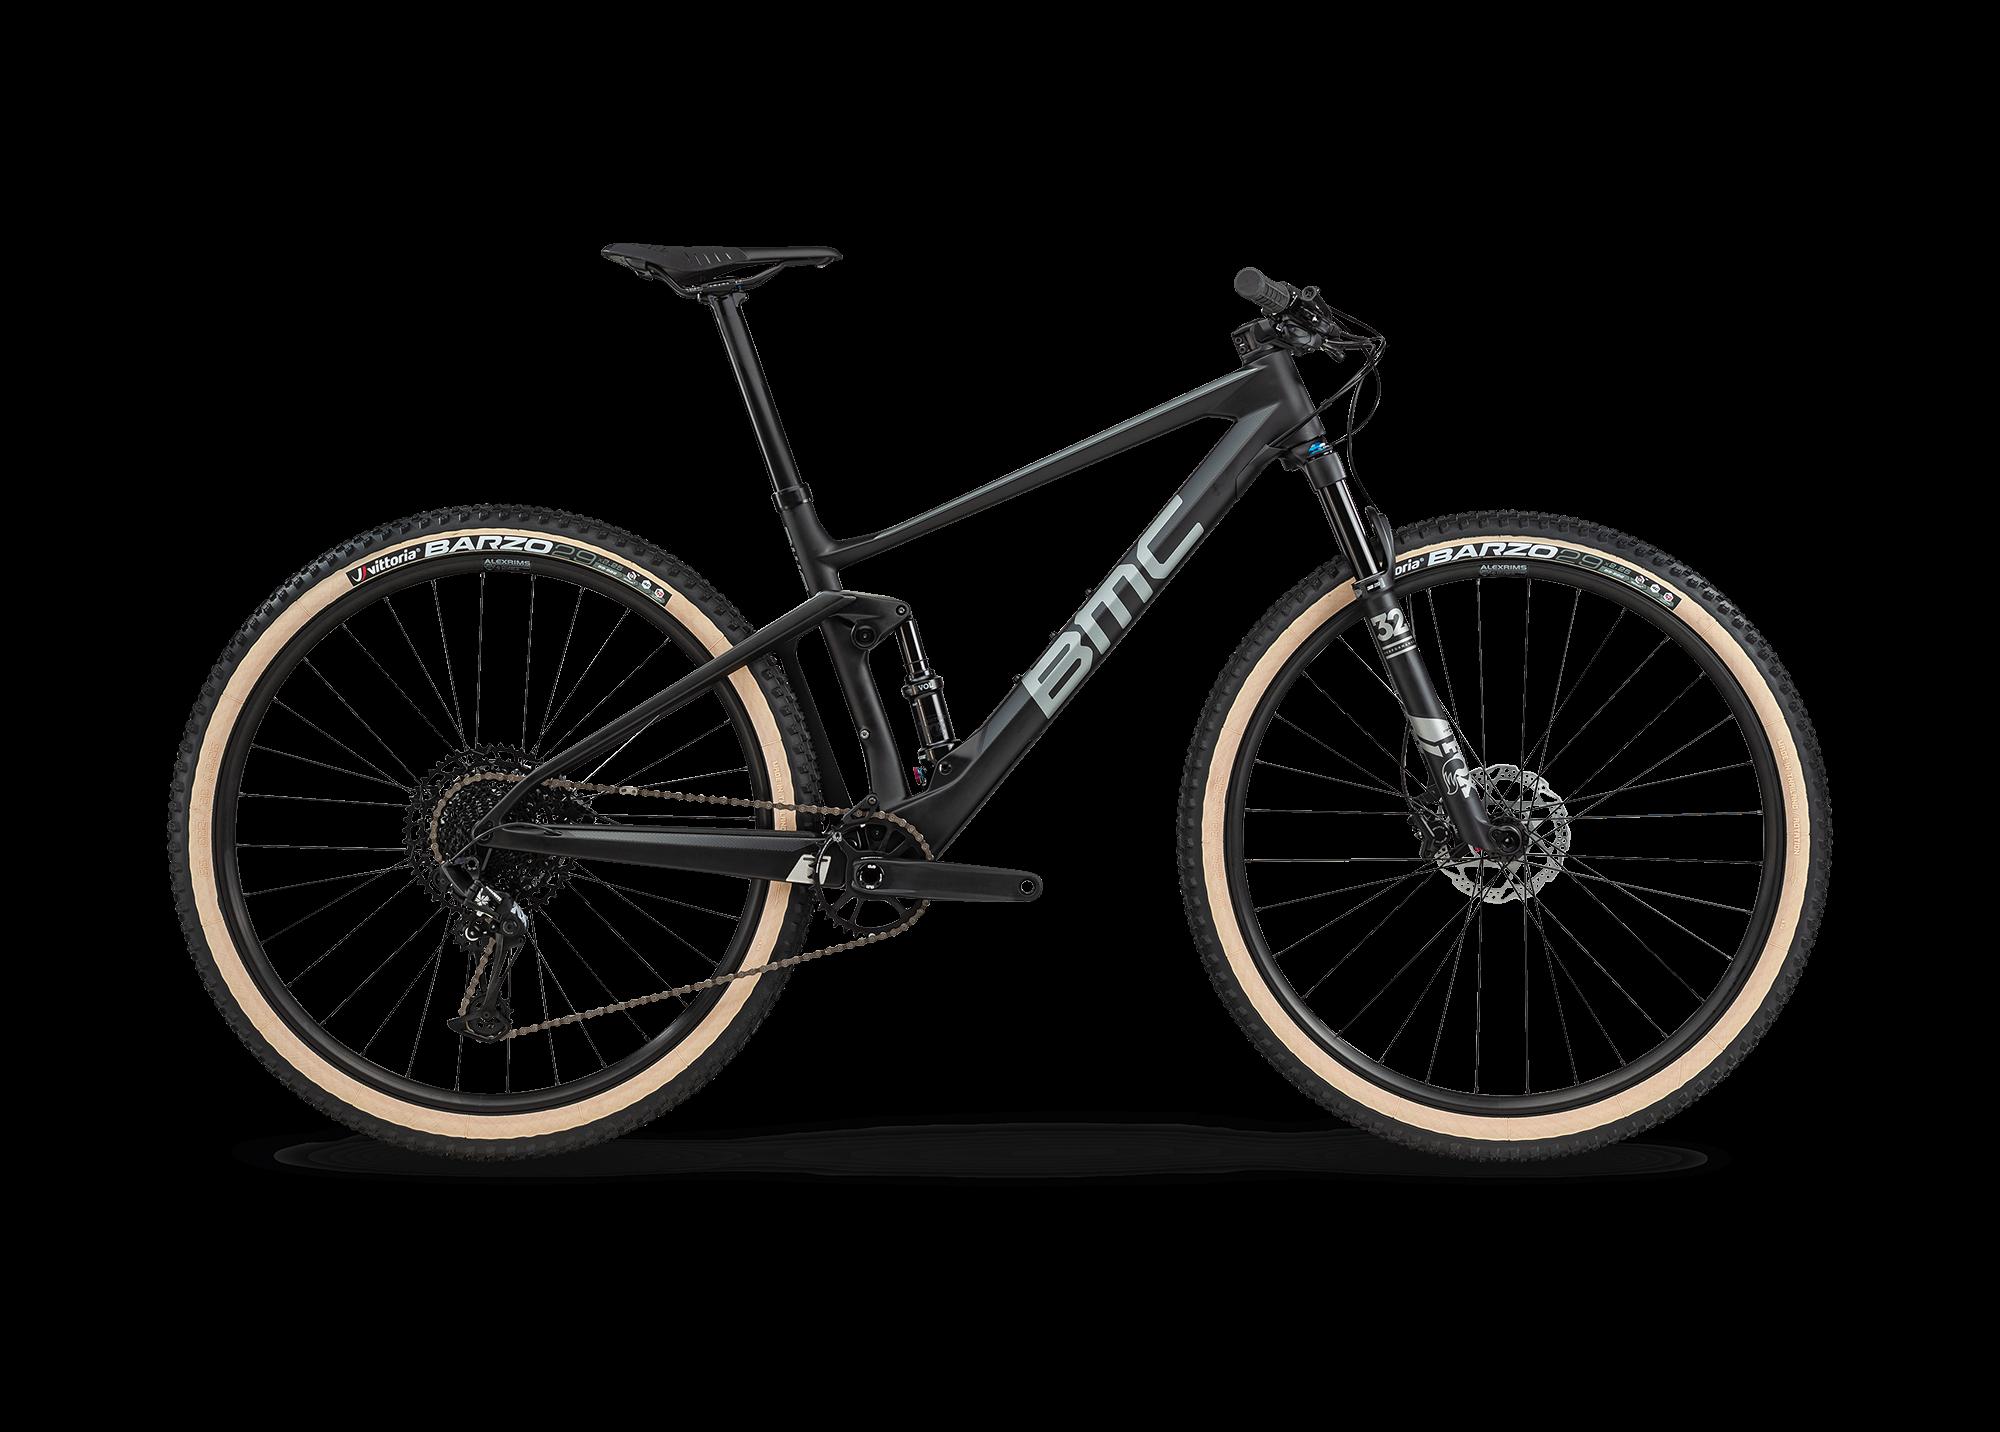 BMC BMX Fourstroke 01 Three 2020